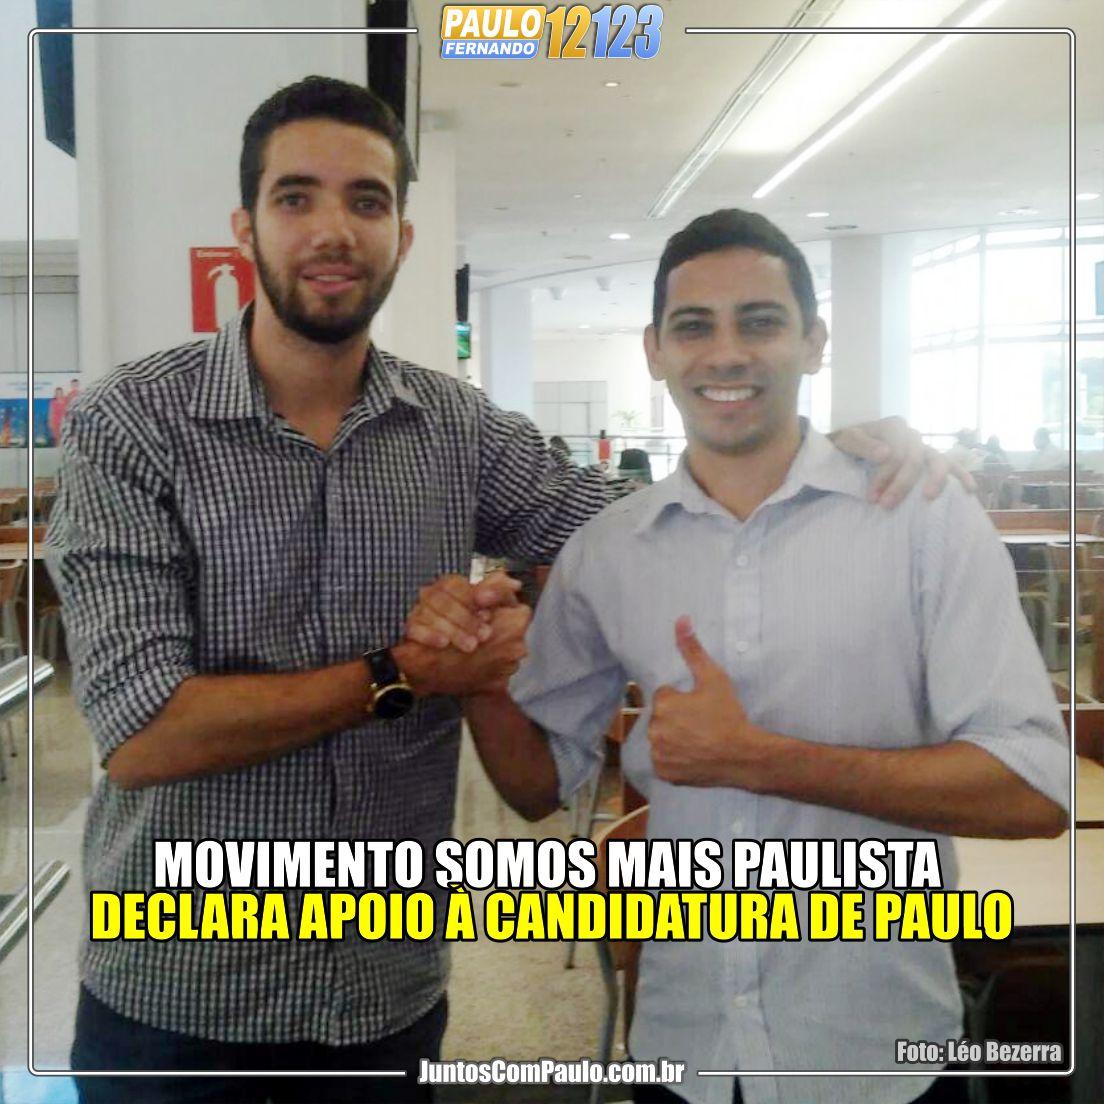 confira-na-integra-a-nota-de-apoio-do-movimento-somos-mais-paulista